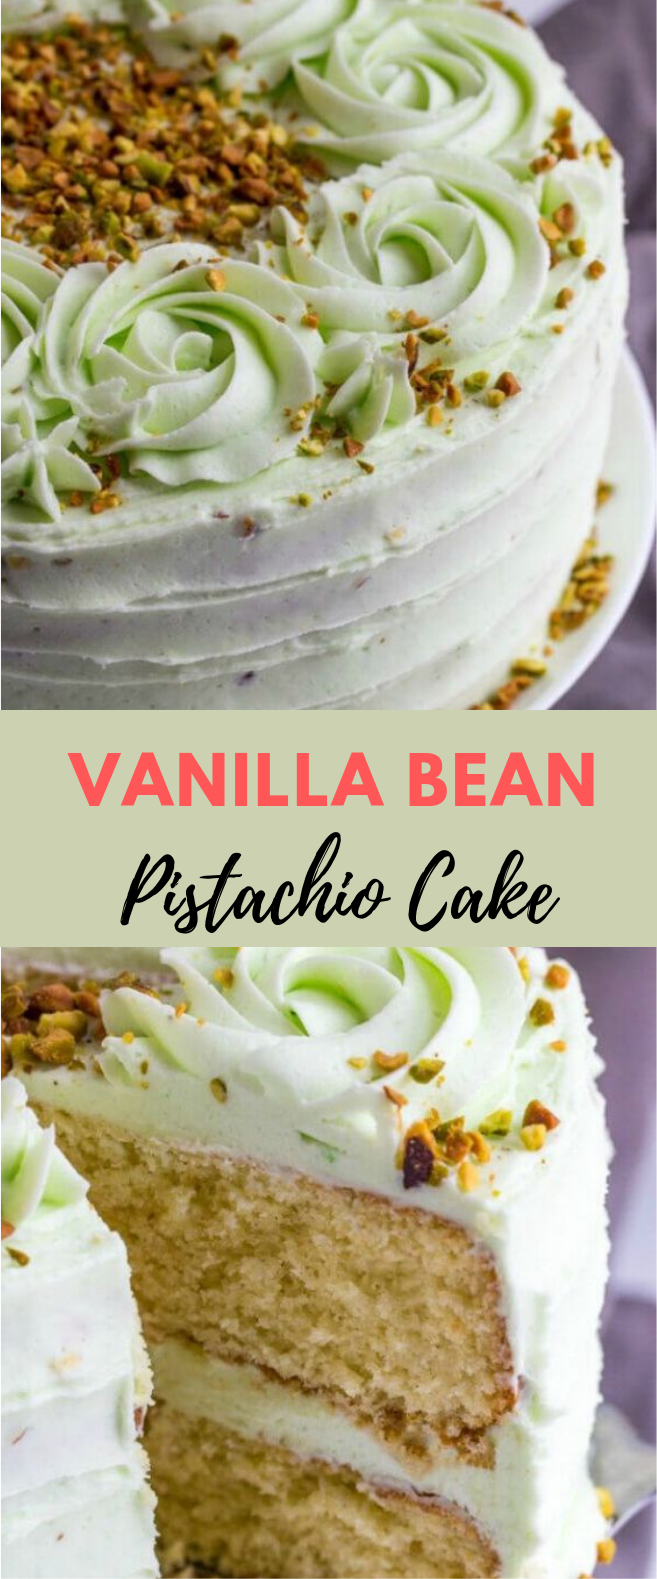 VANILLA BEAN PISTACHIO CAKE #cake #dessert